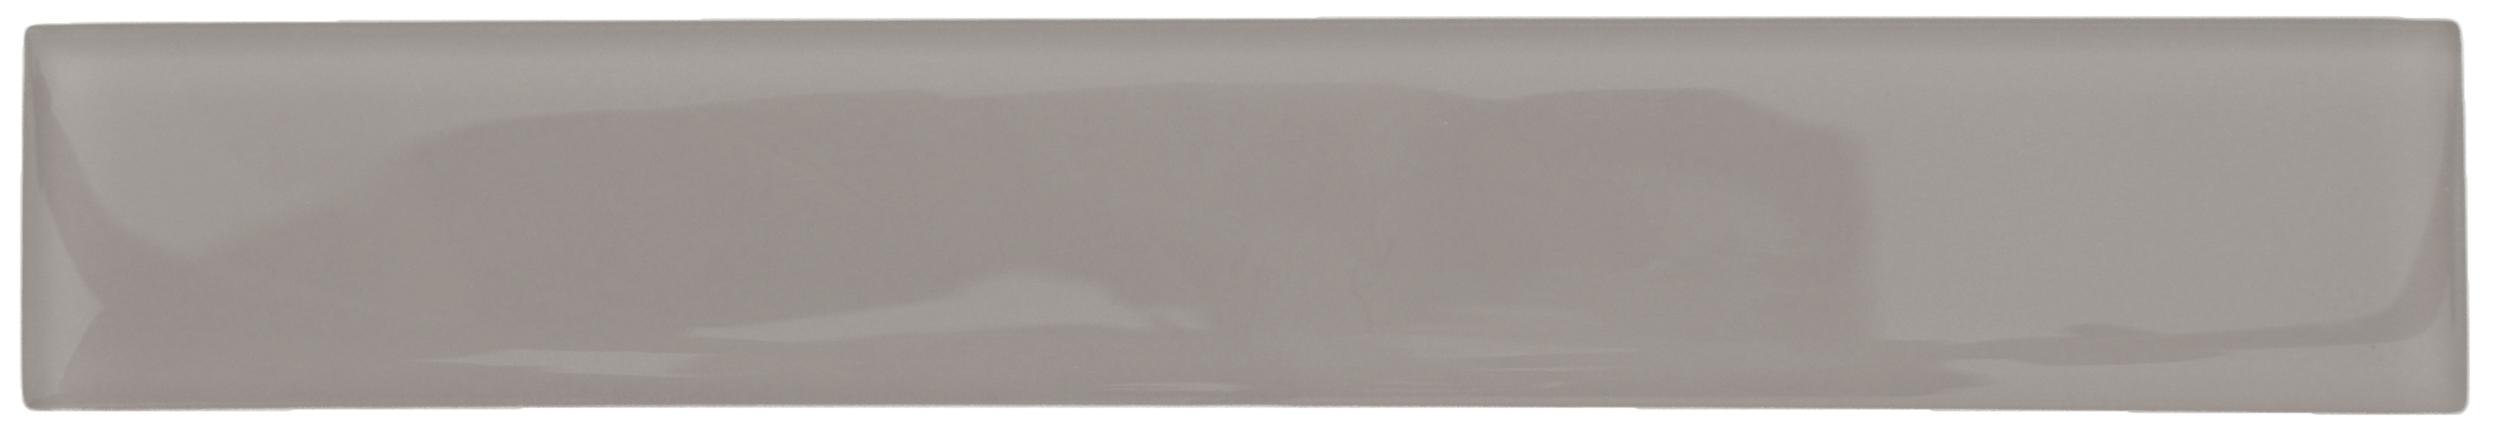 "MG106G, Sky Grey Glossy, 2"" x 11.75"""